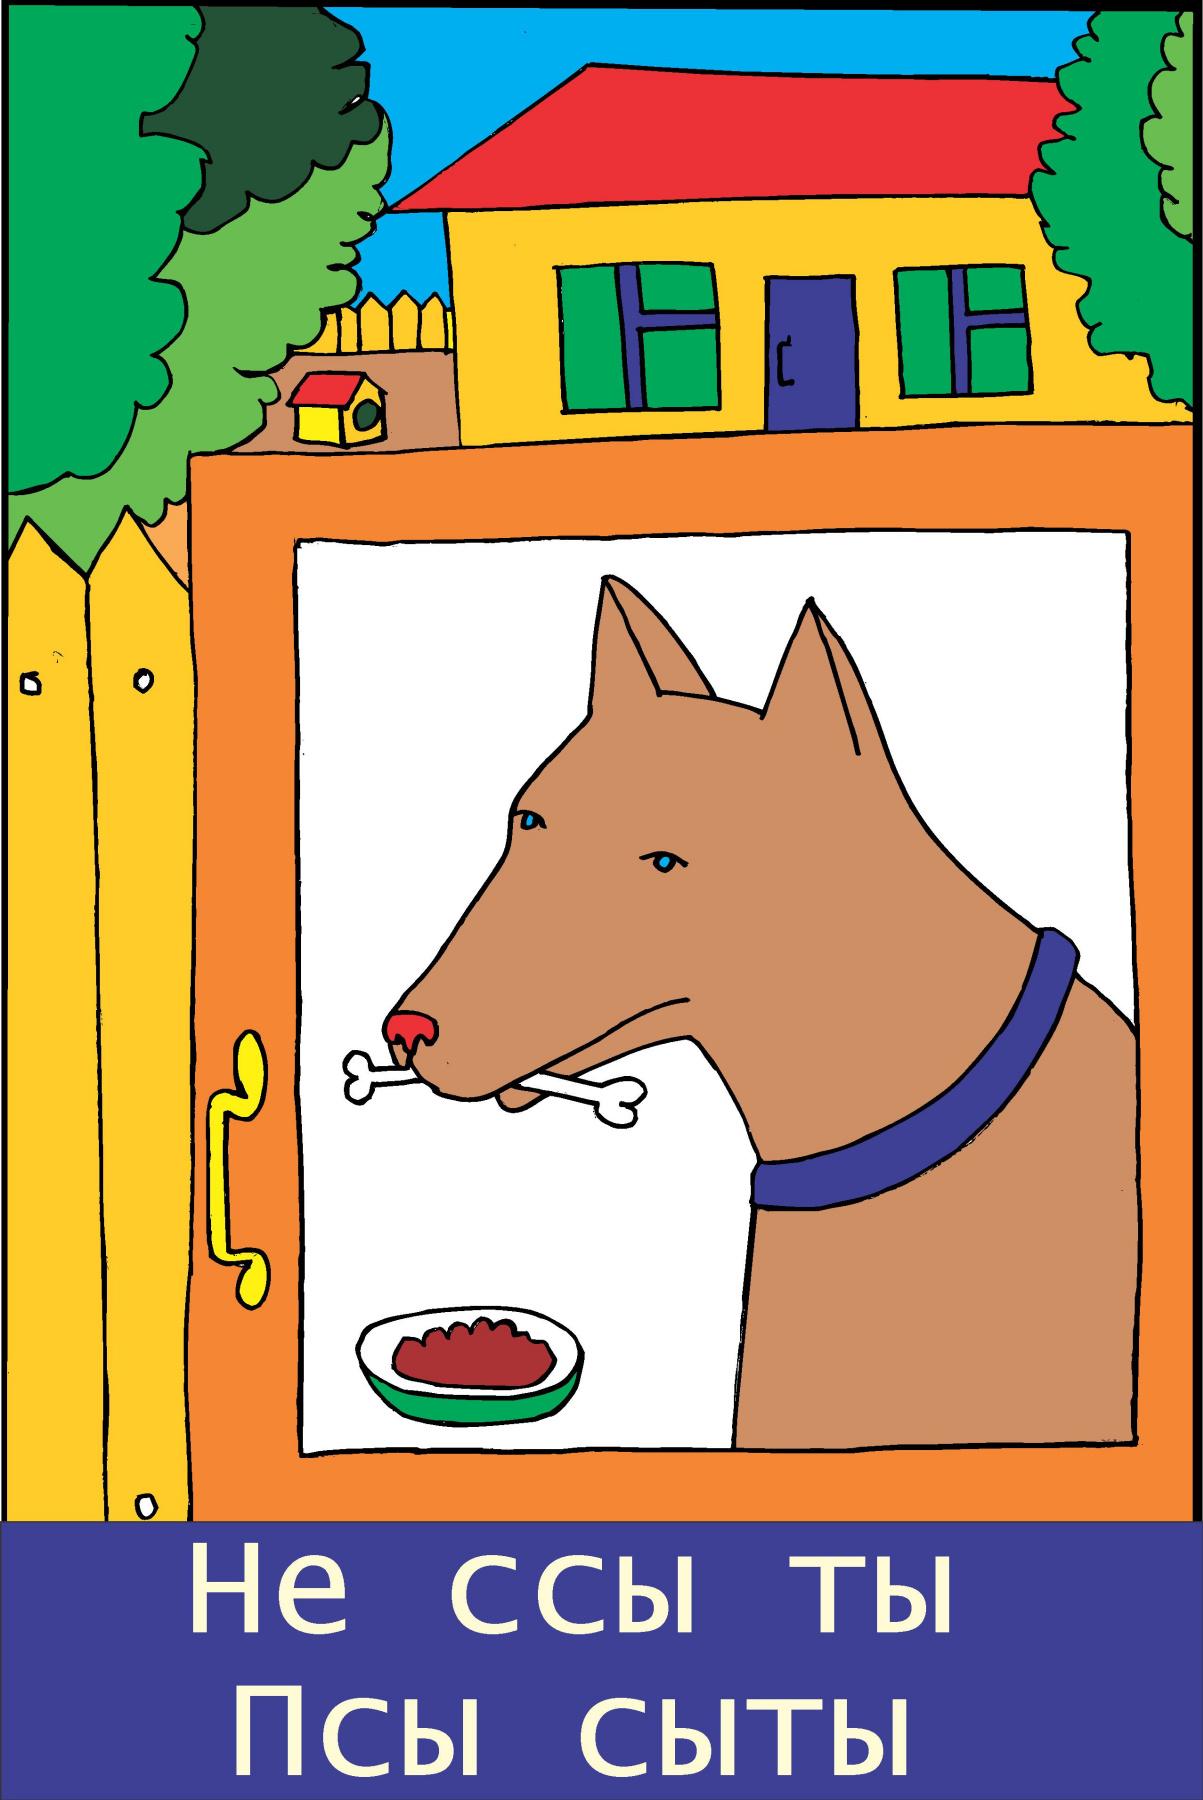 German iordanskii. About dogs